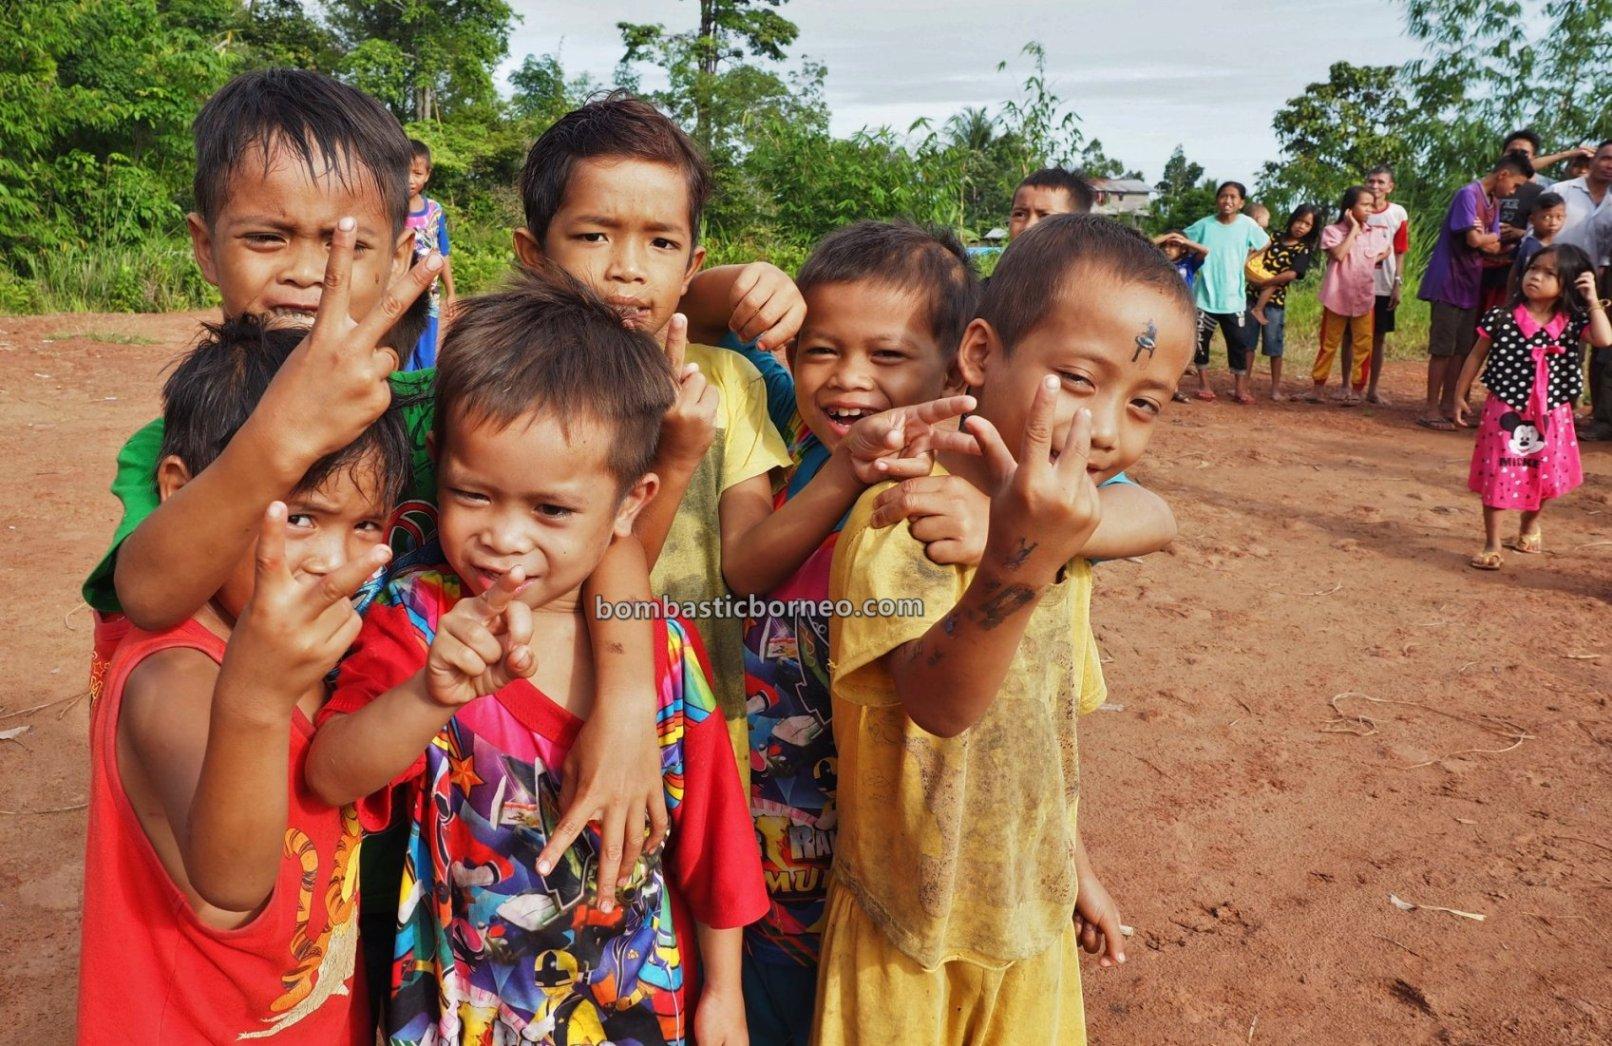 Traditional, indigenous, destination, Indonesia, Bengkayang, Siding, ethnic, Dayak Bidayuh, tribal, tribe, Tourism, travel guide, highland, 婆罗洲达雅部落, 西加里曼丹原住民